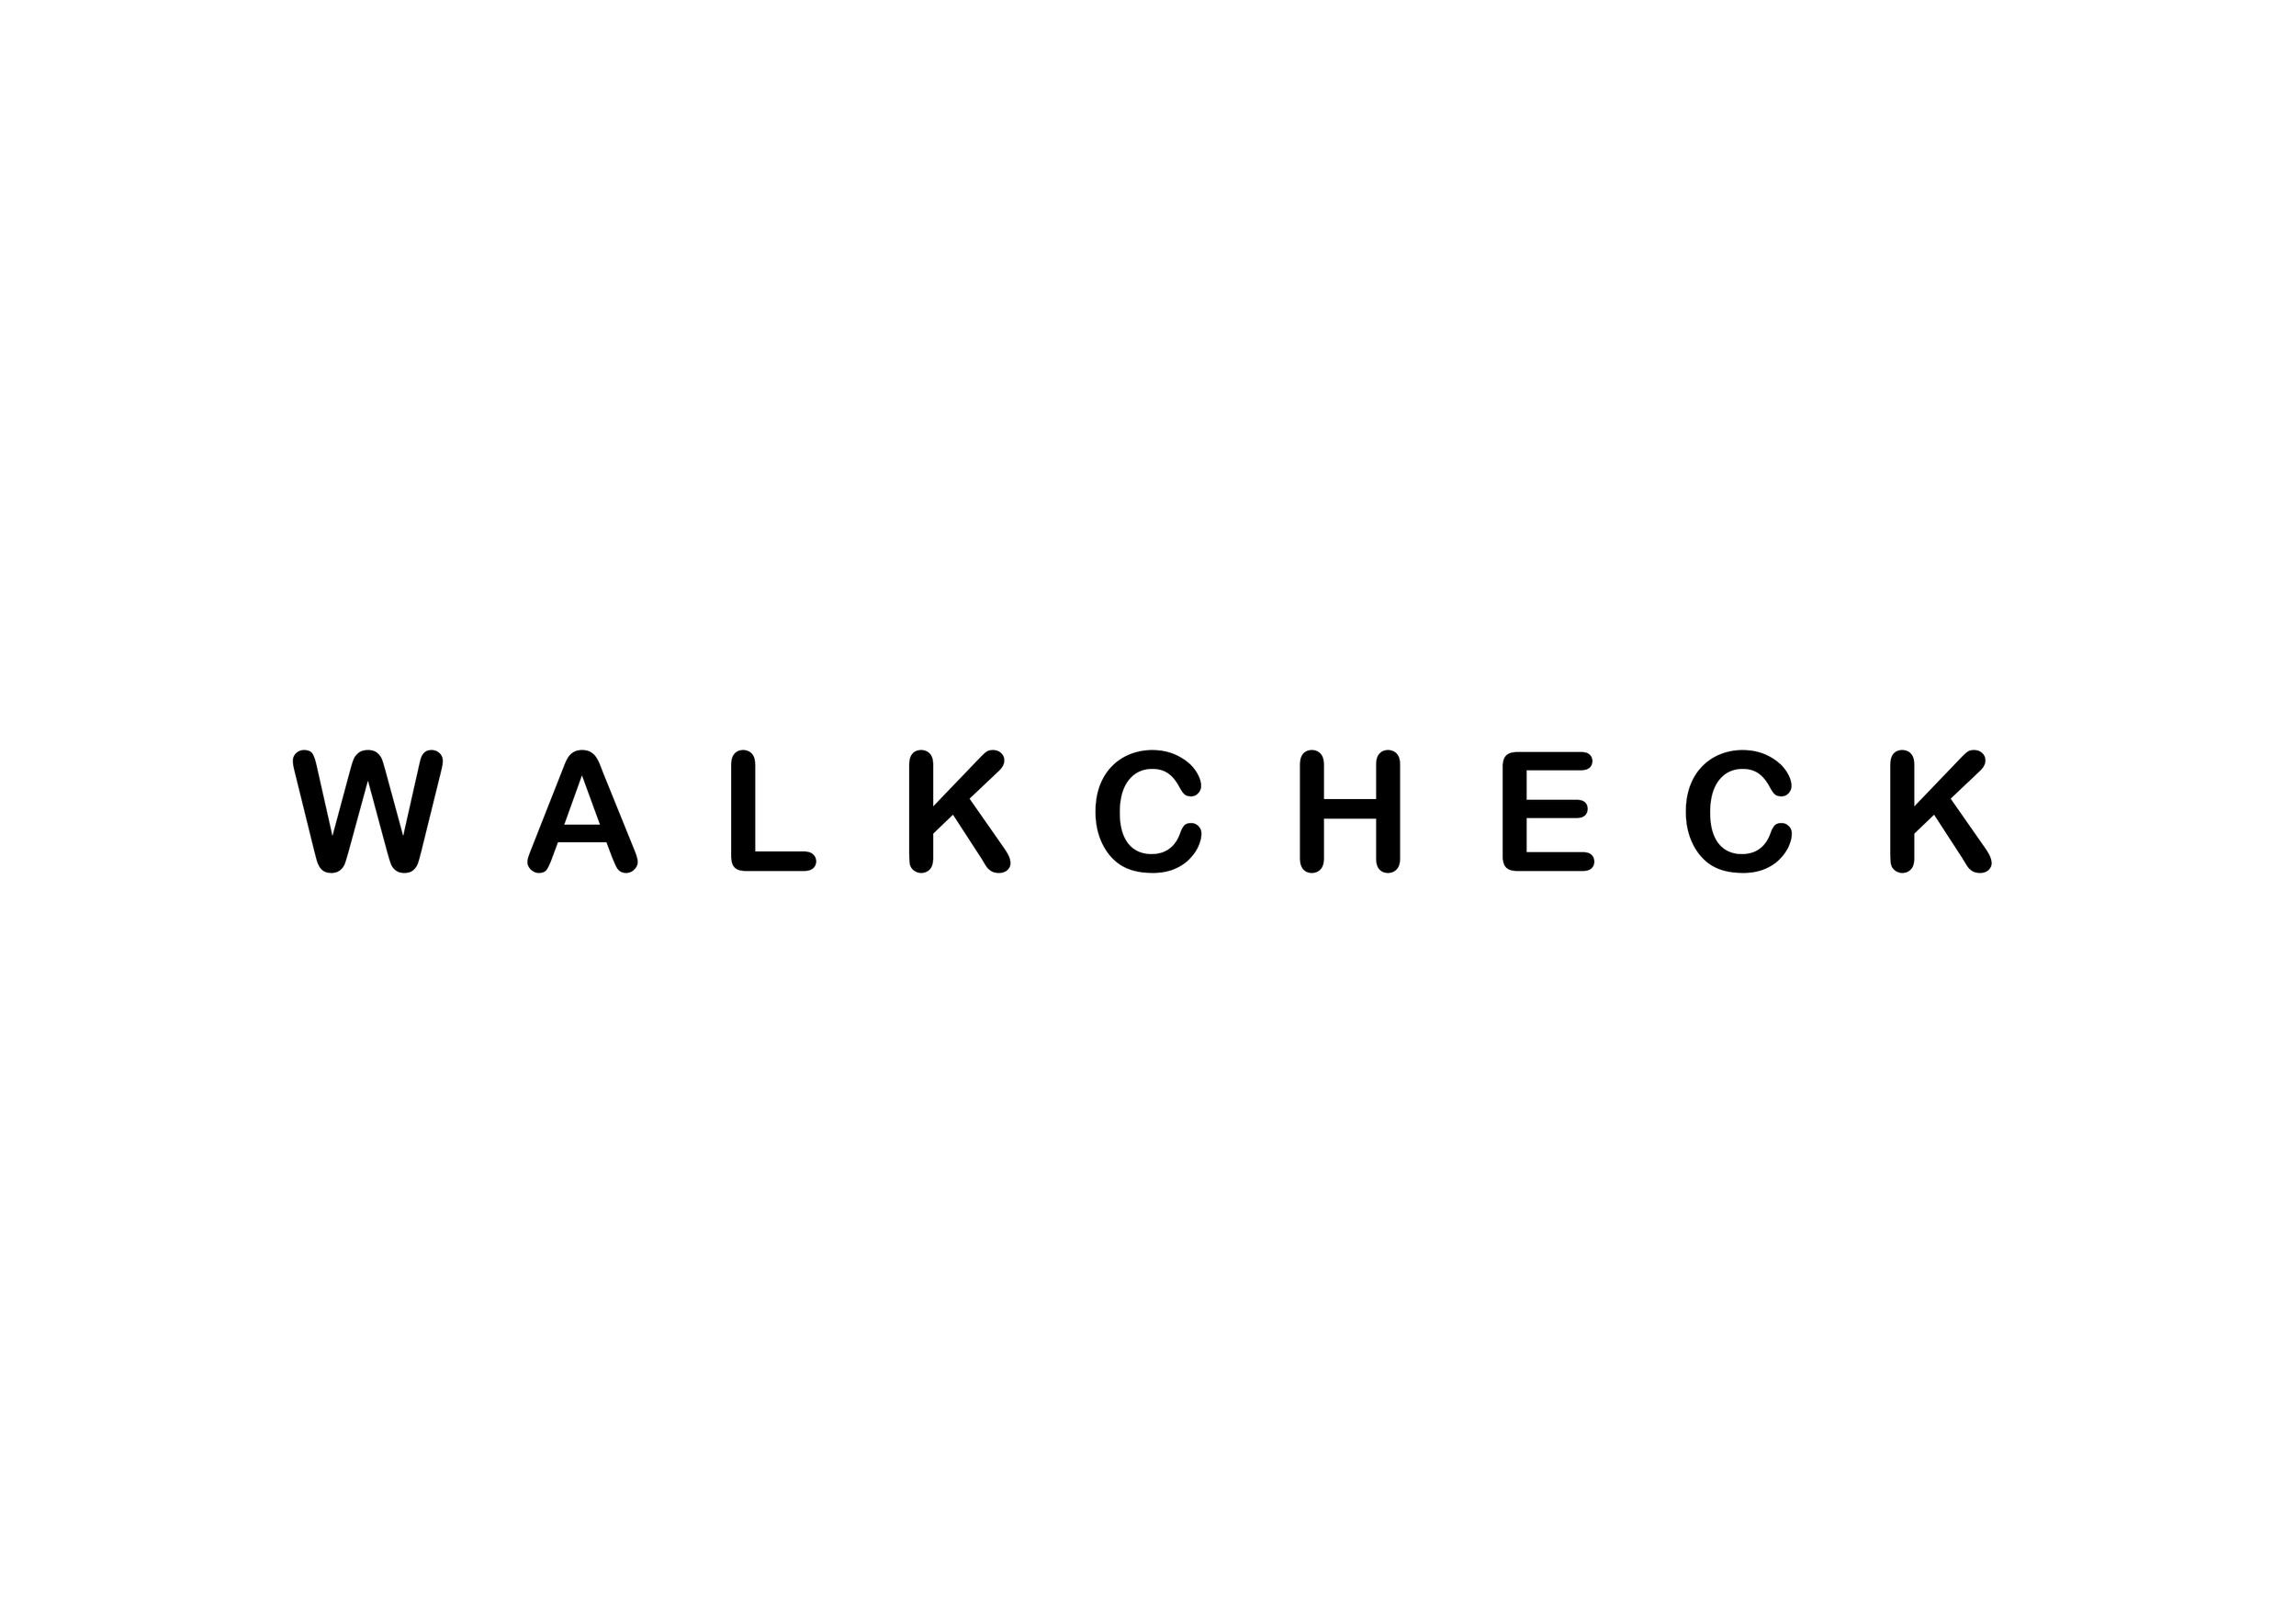 Walkcheck logo.png